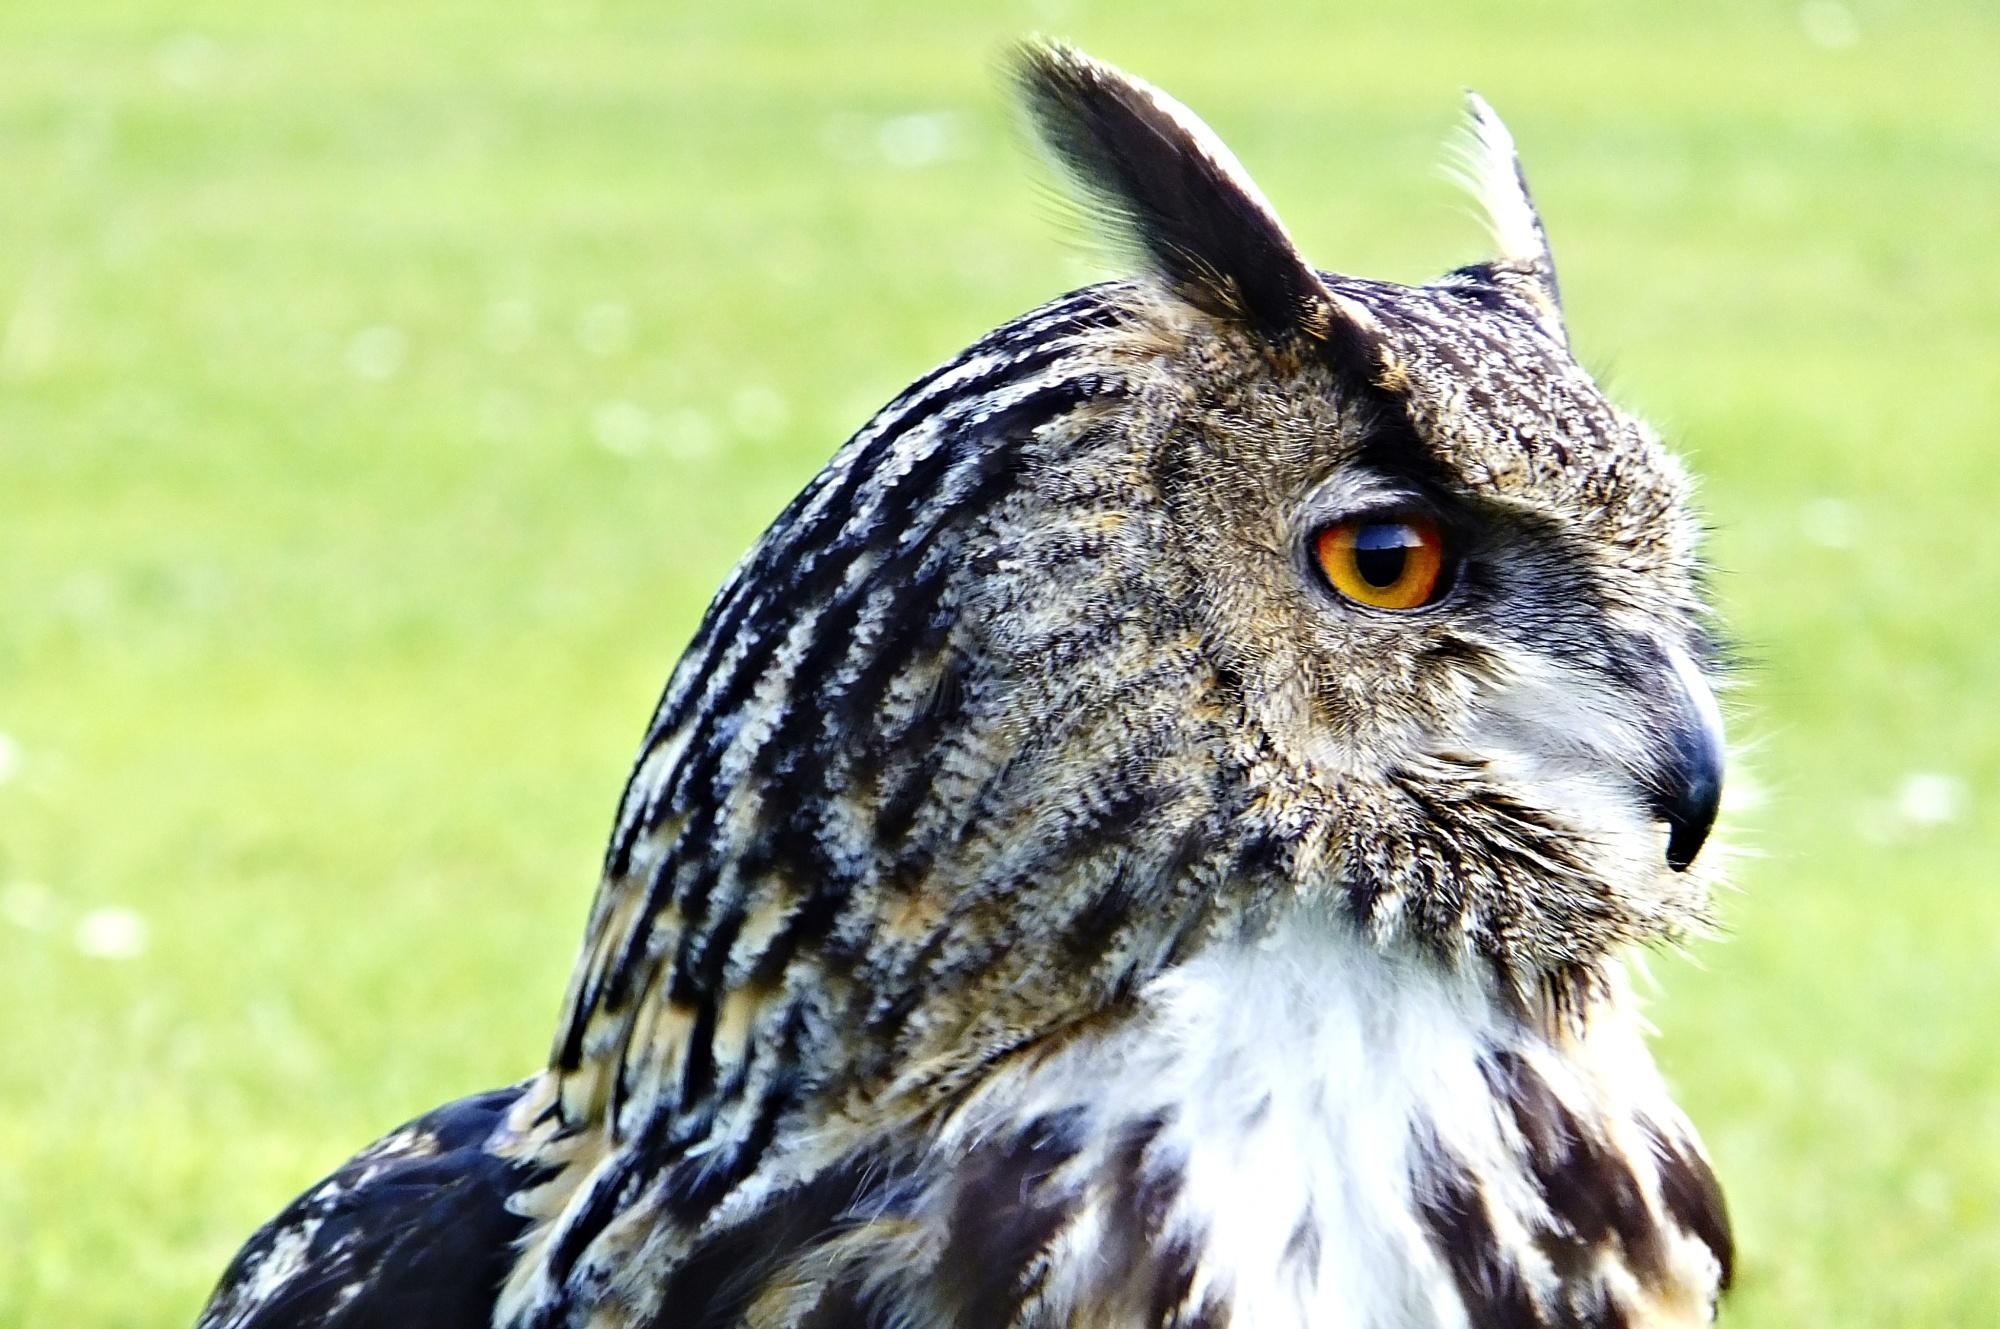 Daphne the European Eagle Owl